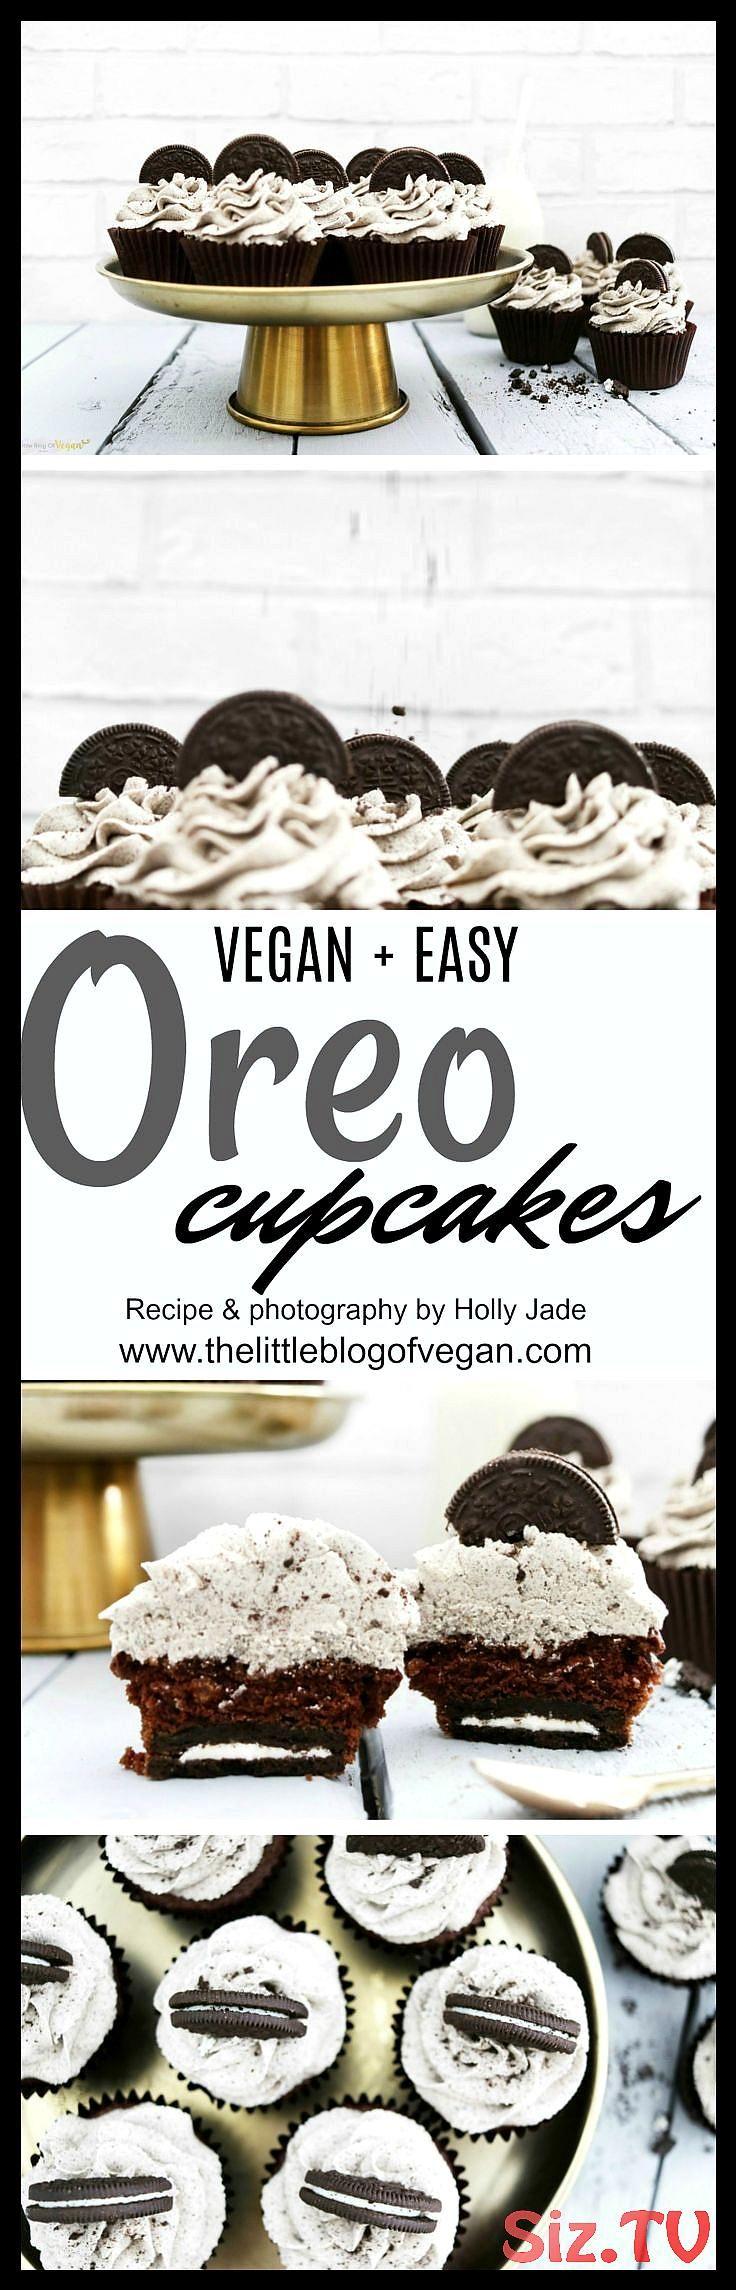 The best vegan Oreo cupcake recipe THE BEST vegan oreo cupcakes with a hidden oreo with thick 038 creamy oreo frosting 30 minutes to make what better The best vegan Oreo...